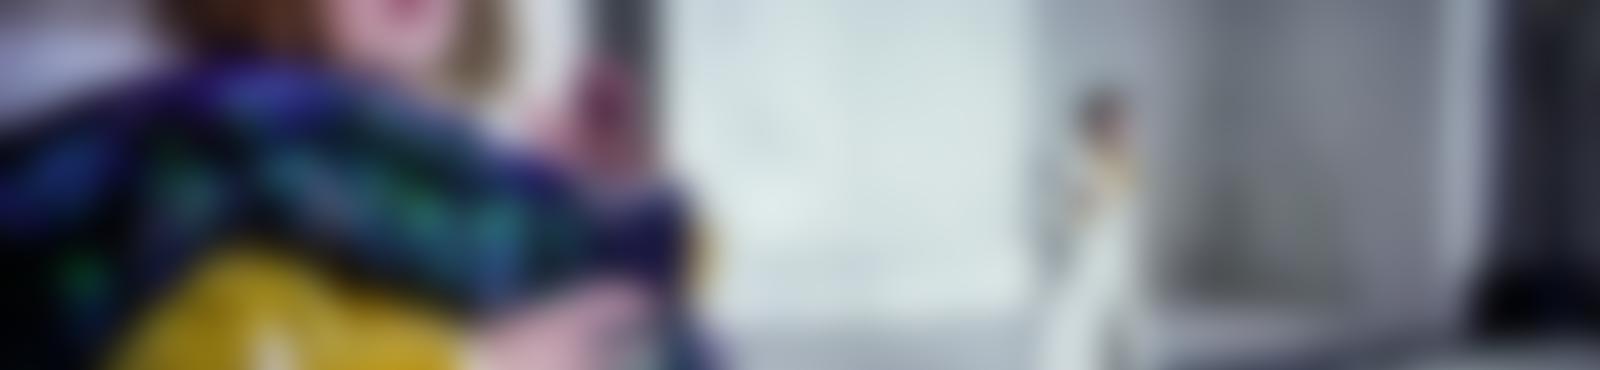 Blurred e210bb6b 84b0 47a2 9fba f0367e7406c1